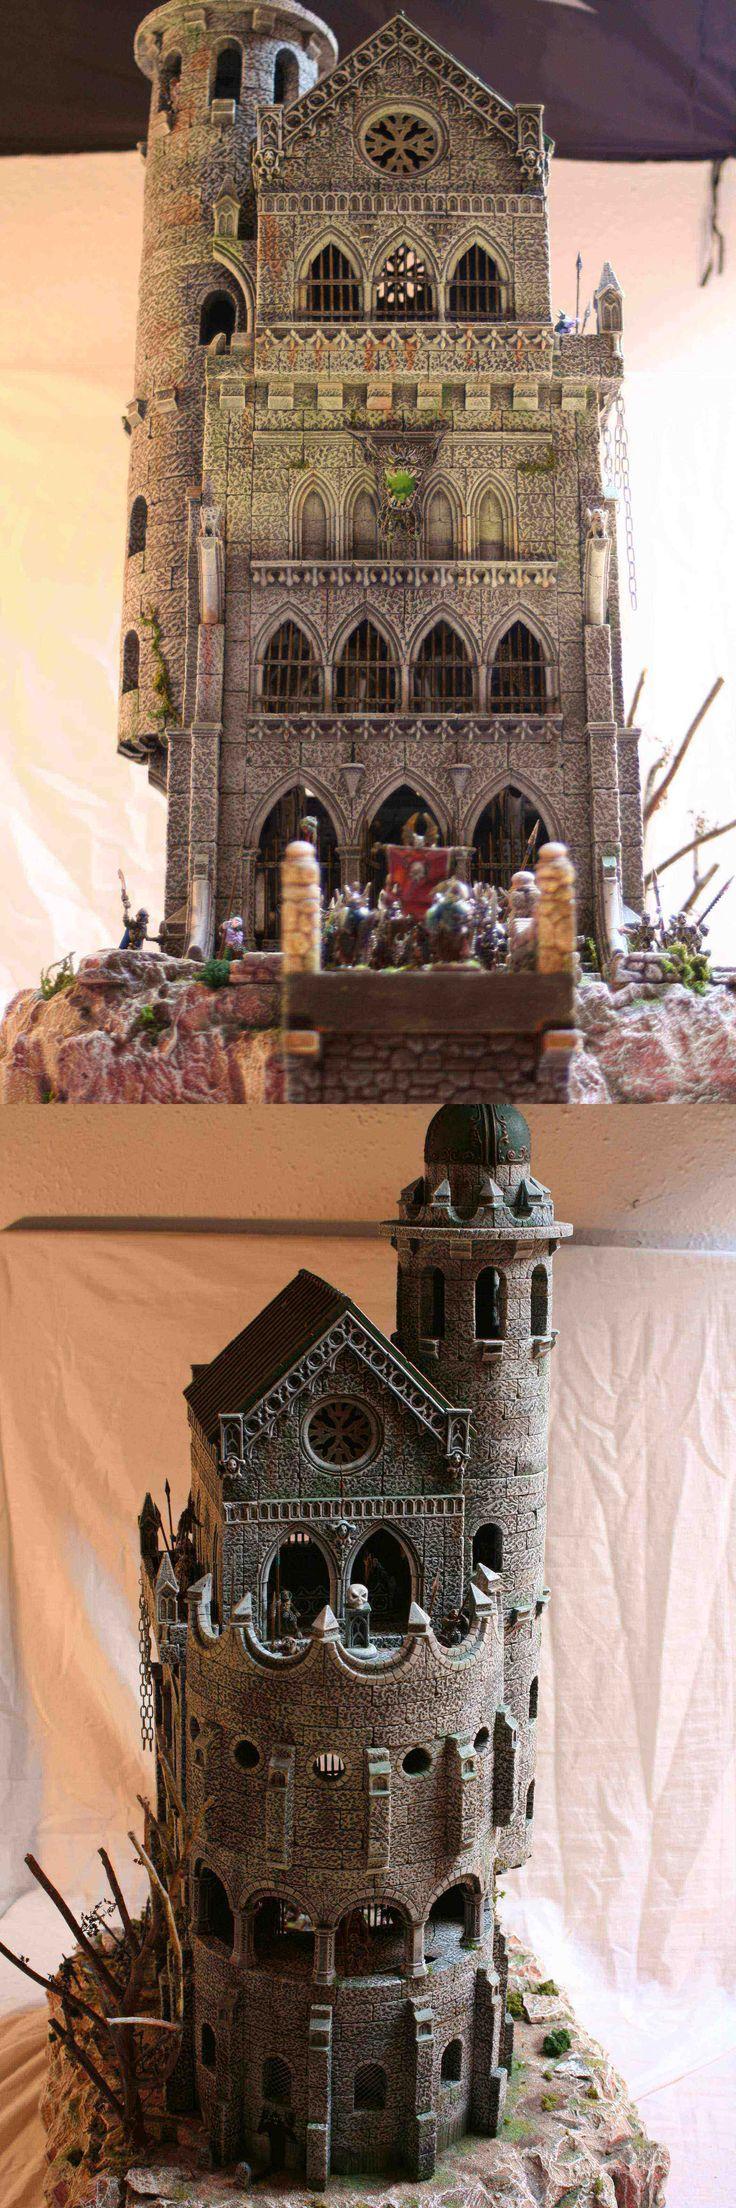 Vampire castle - made with HirstArt molds. Impressive work.